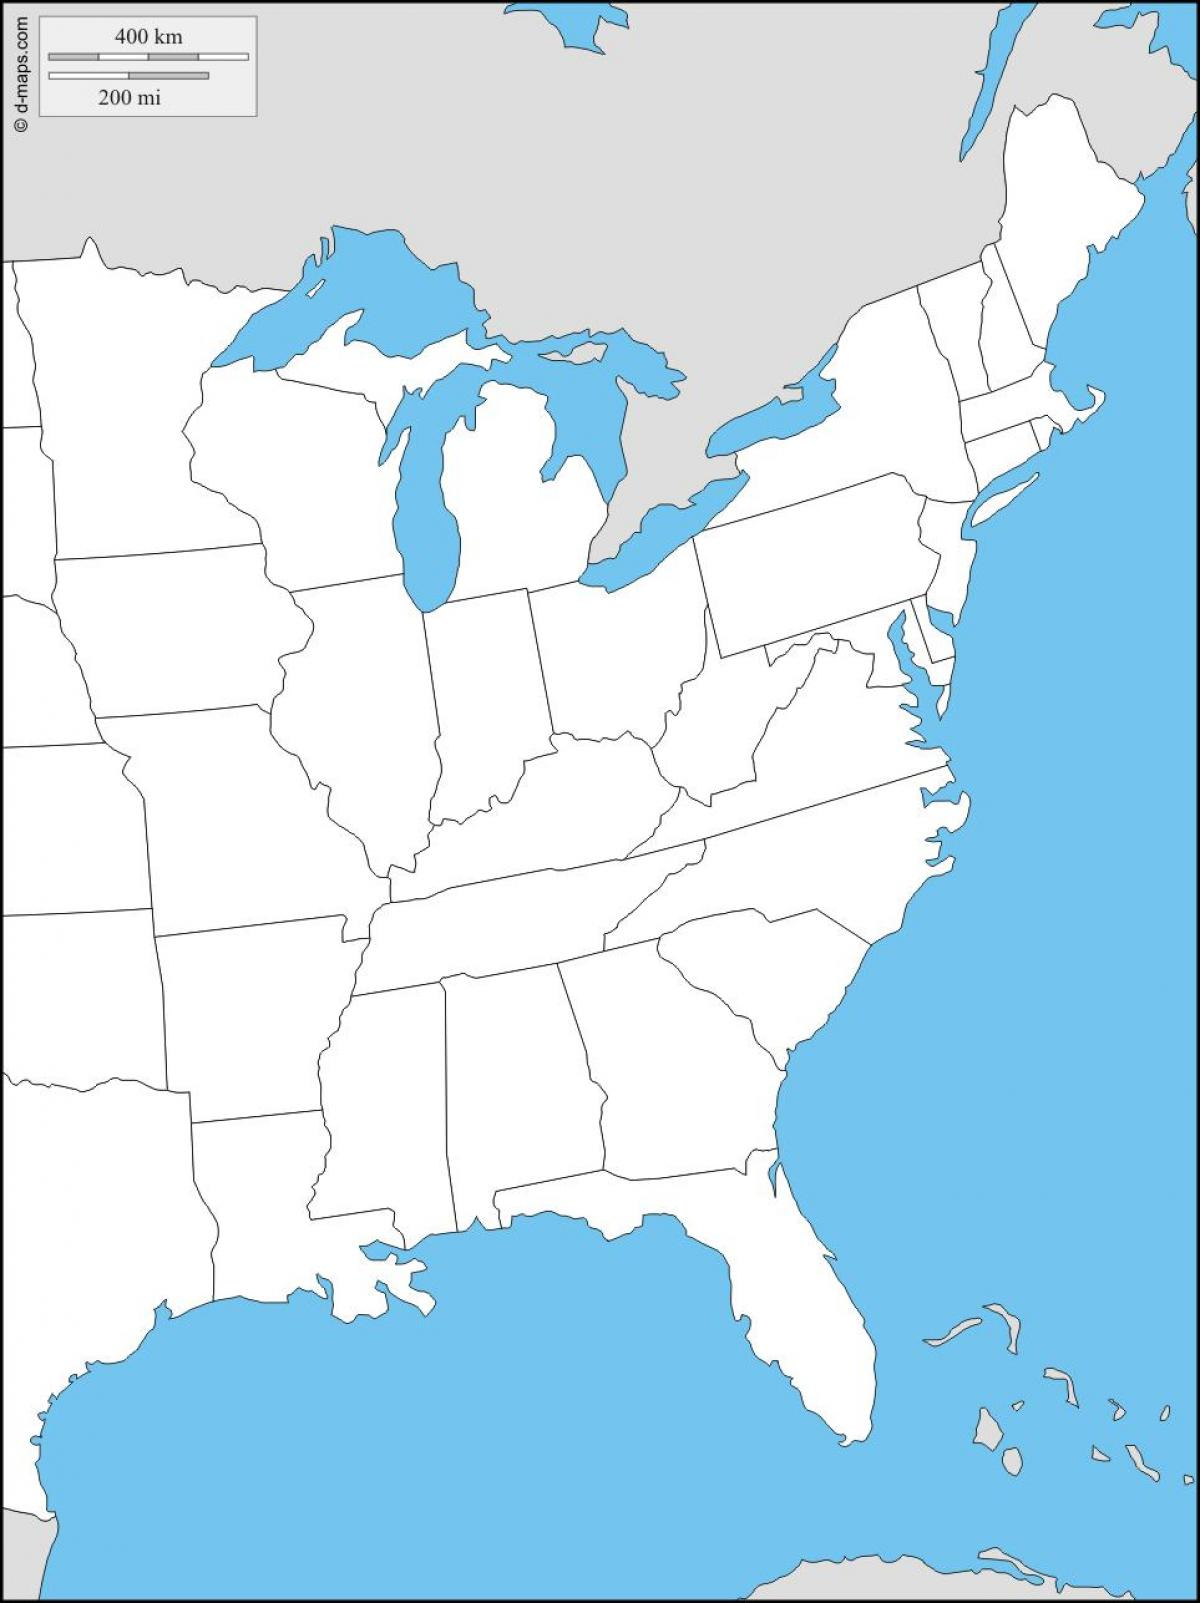 United States east coast map - East coast map of States ...